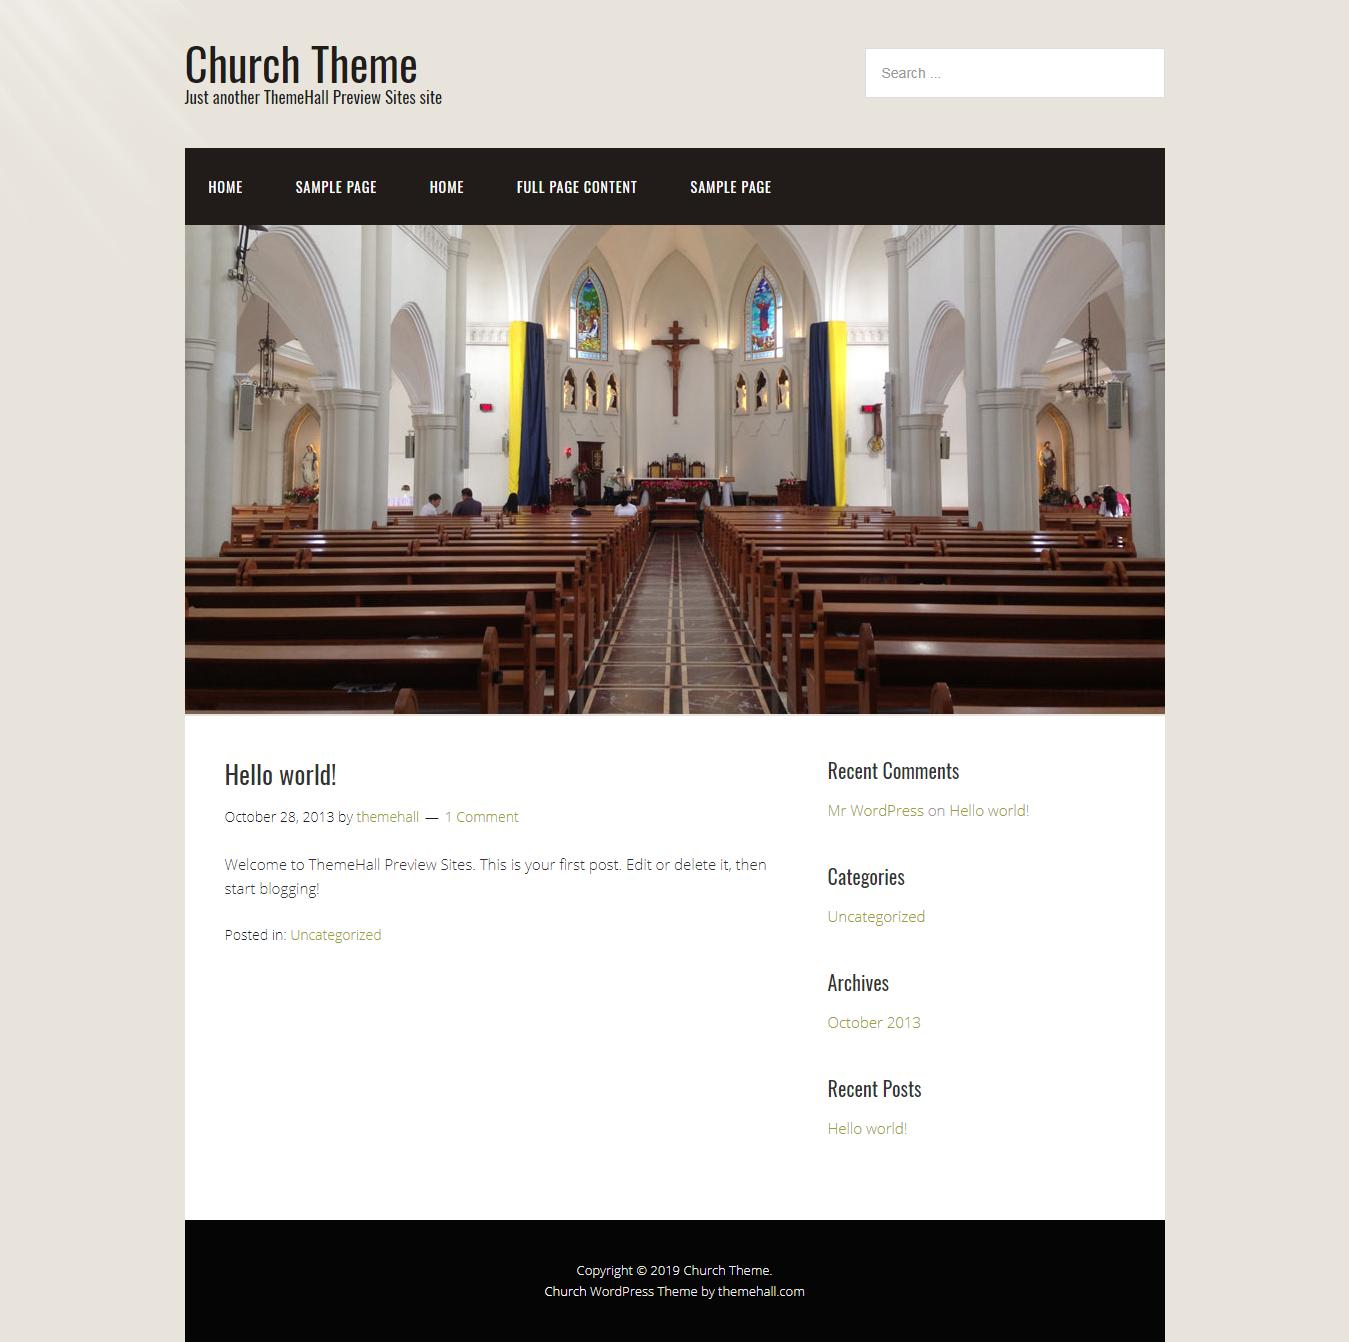 church best free church wordpress theme - 10+ Best Free WordPress Church Themes